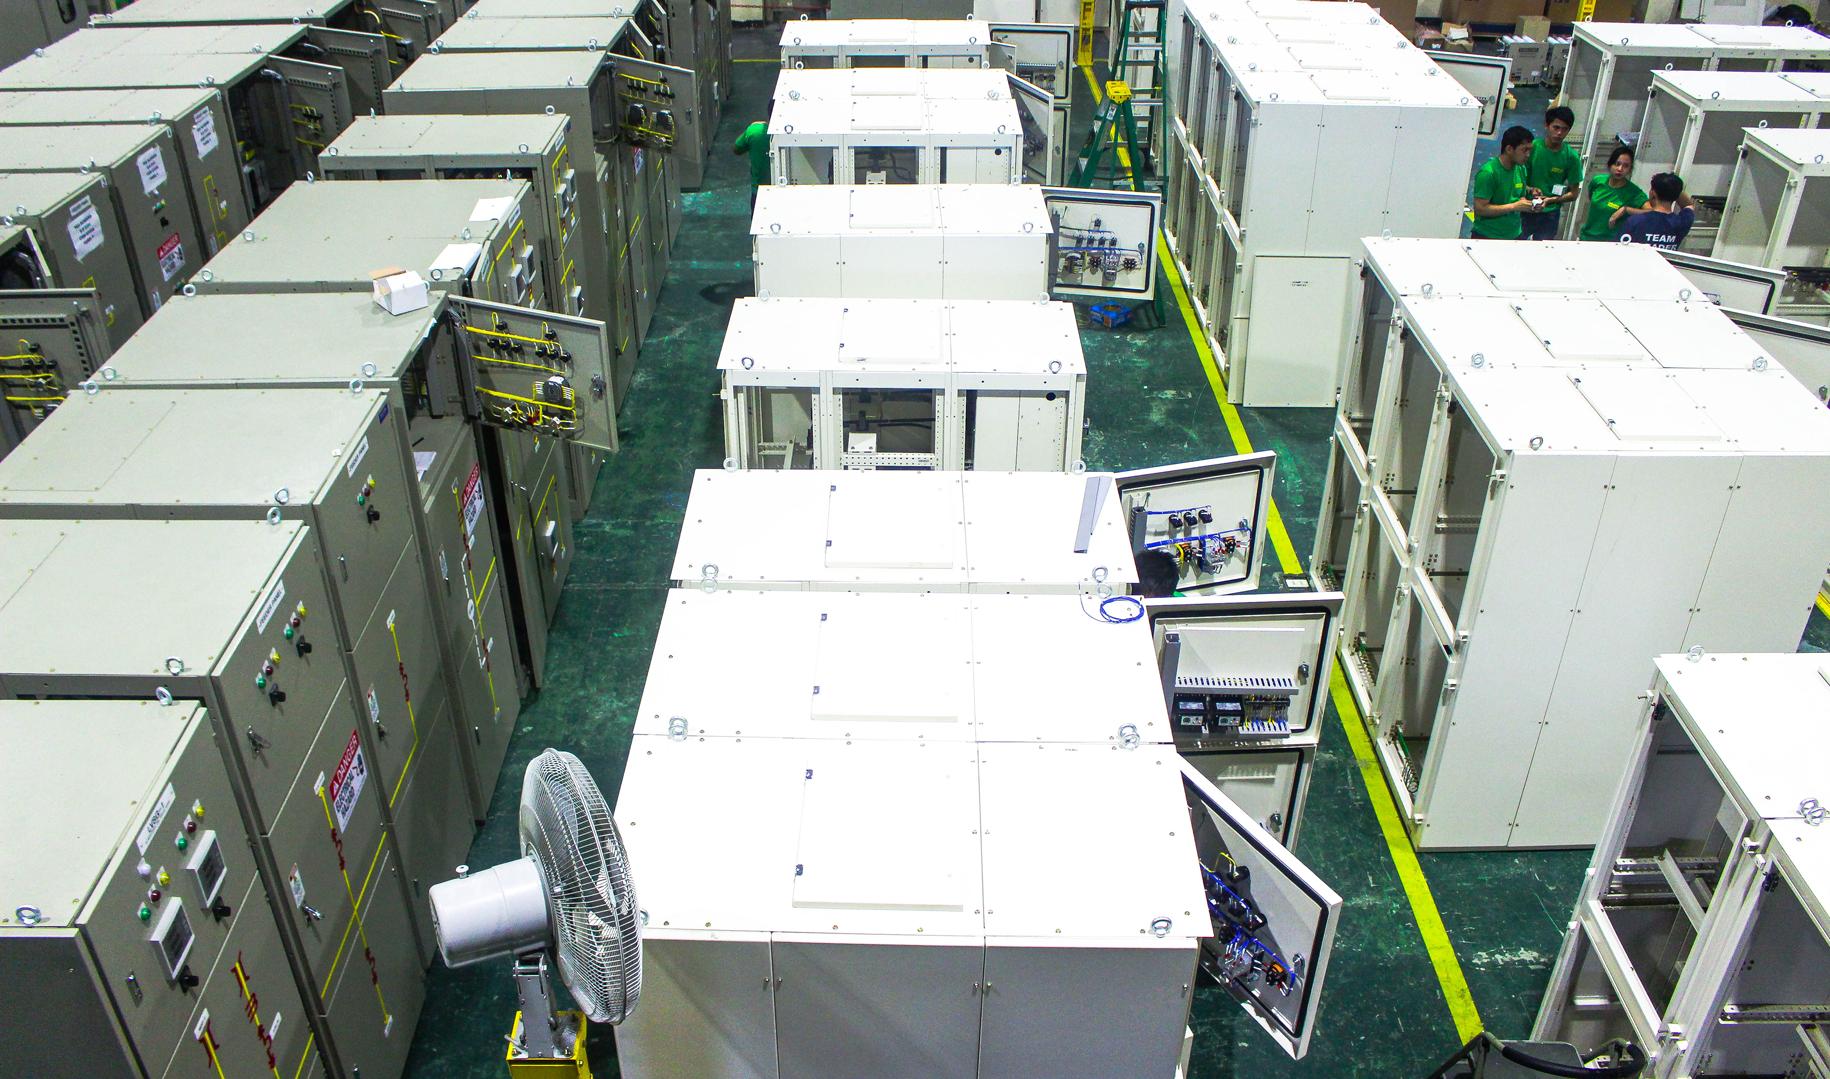 Fuji Haya Electric Corporation